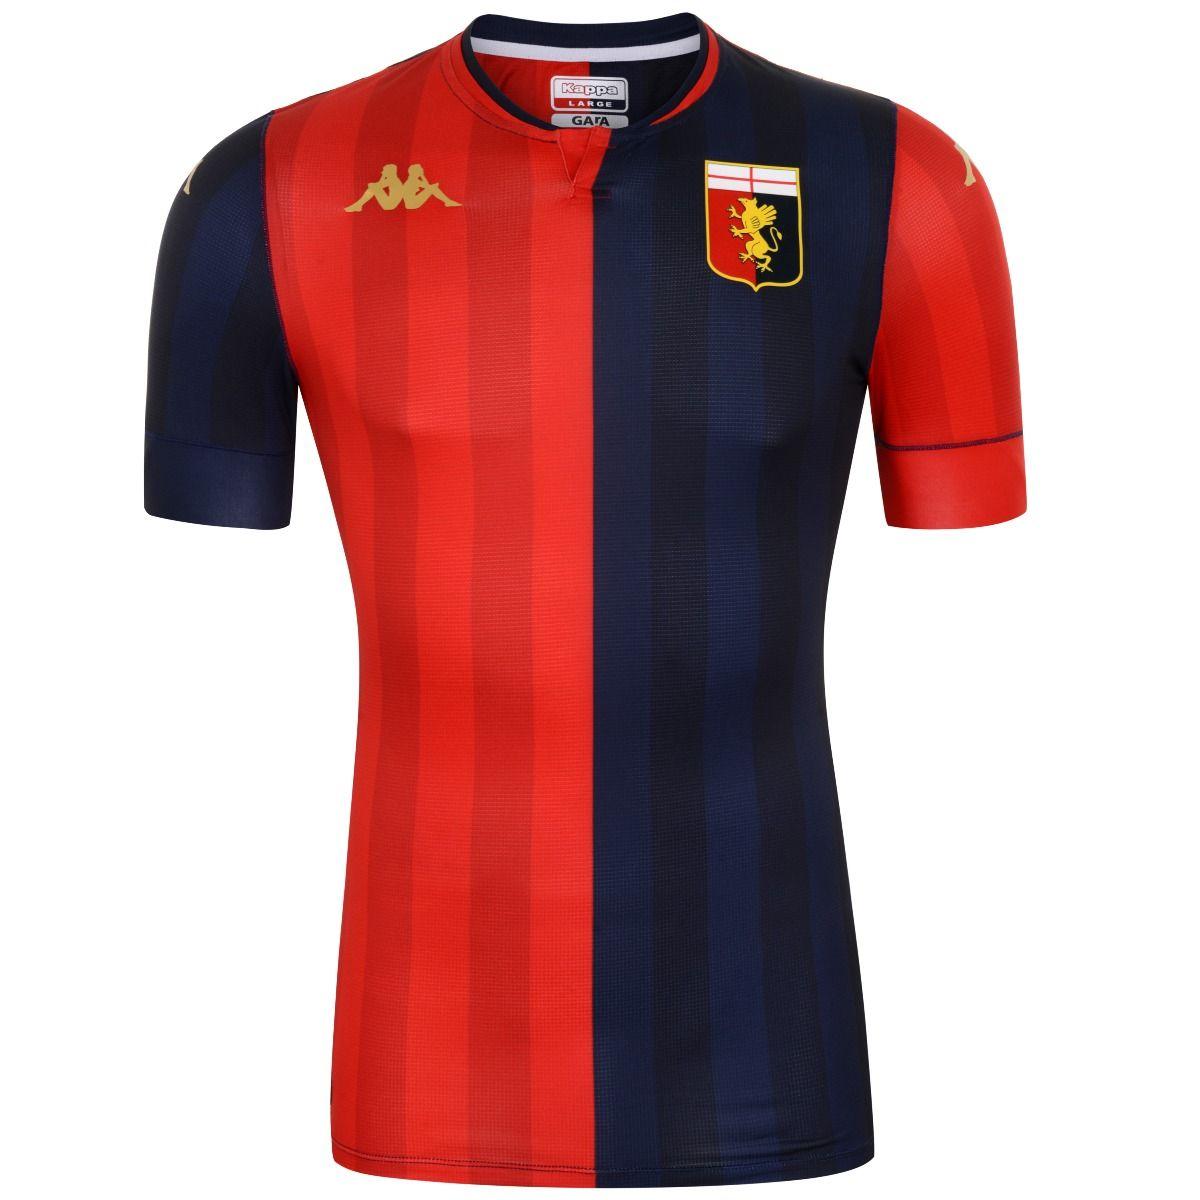 maillot-domicile-genoa-2020-2021-kappa